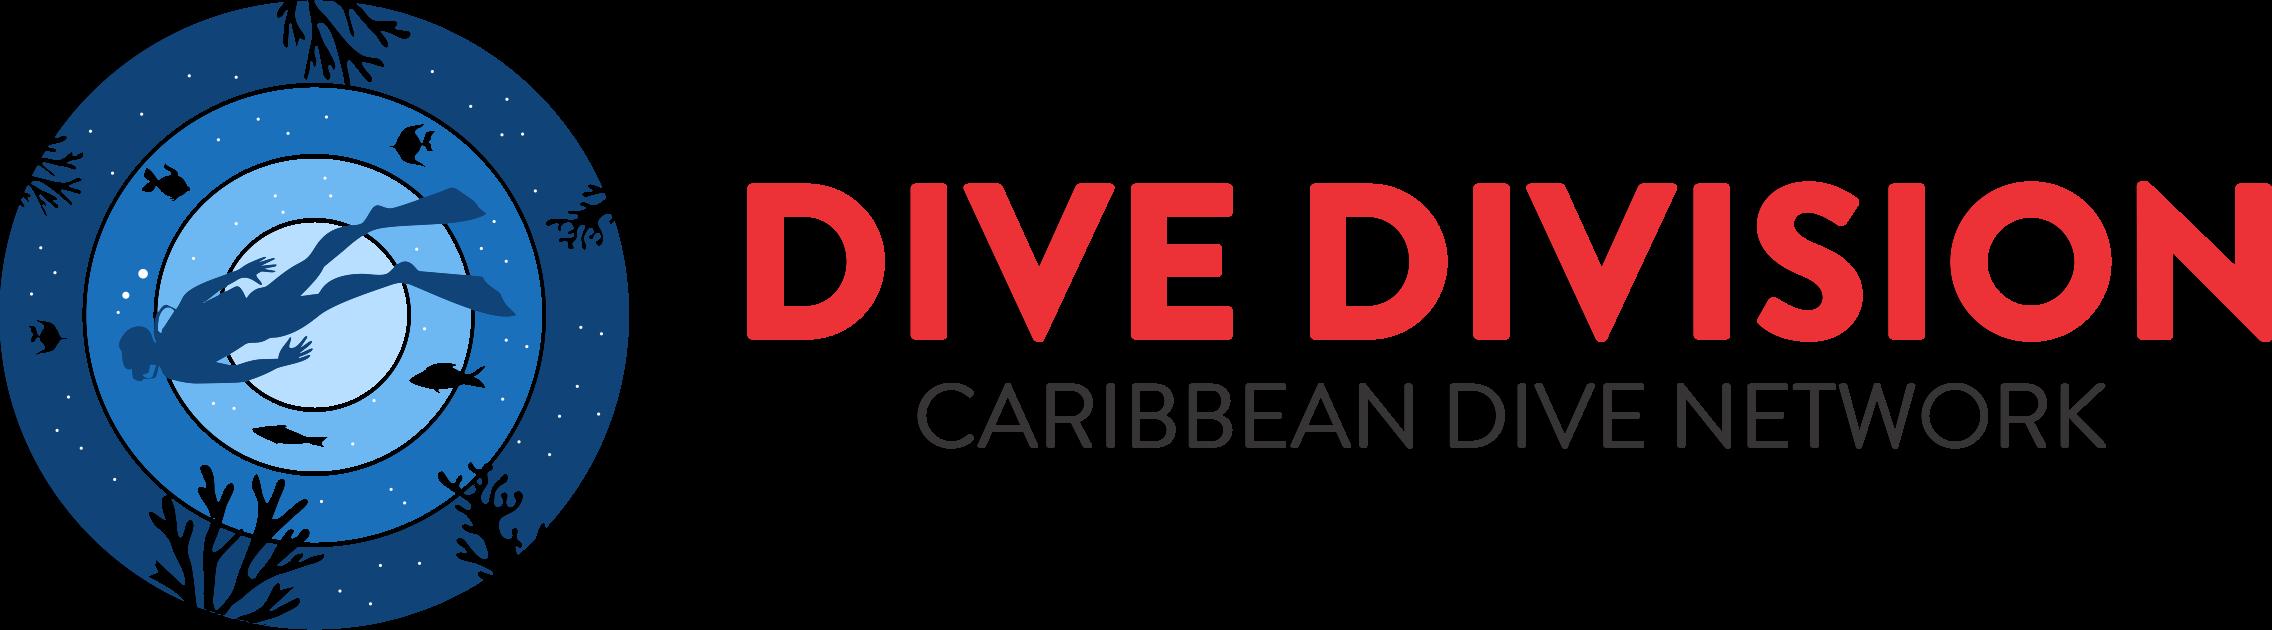 Dive Division